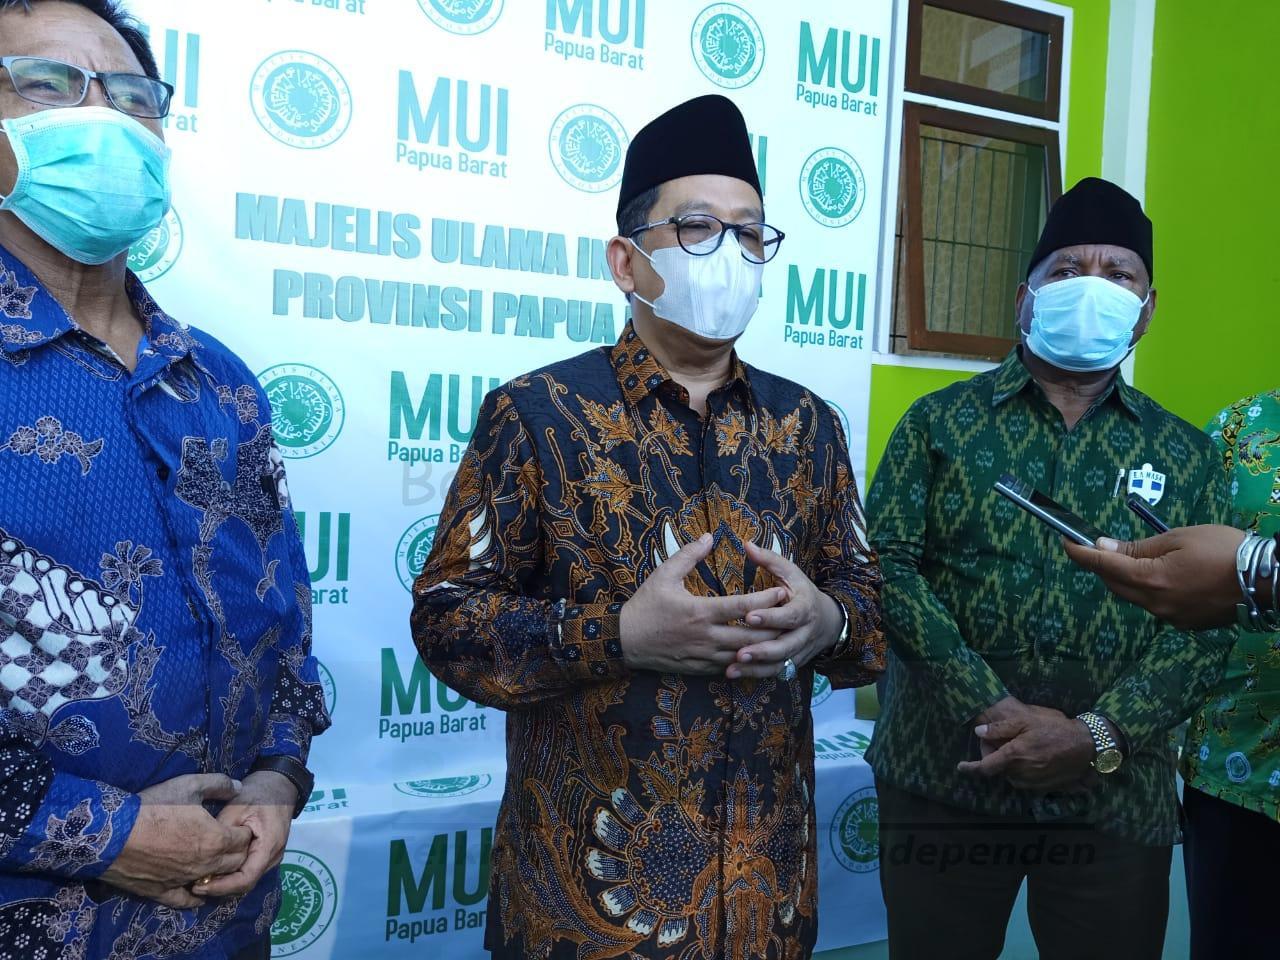 Wakil Menteri Agama Puji Gubernur Mandacan Bisa Jaga Toleransi Umat Beragama 28 IMG 20200821 WA0032